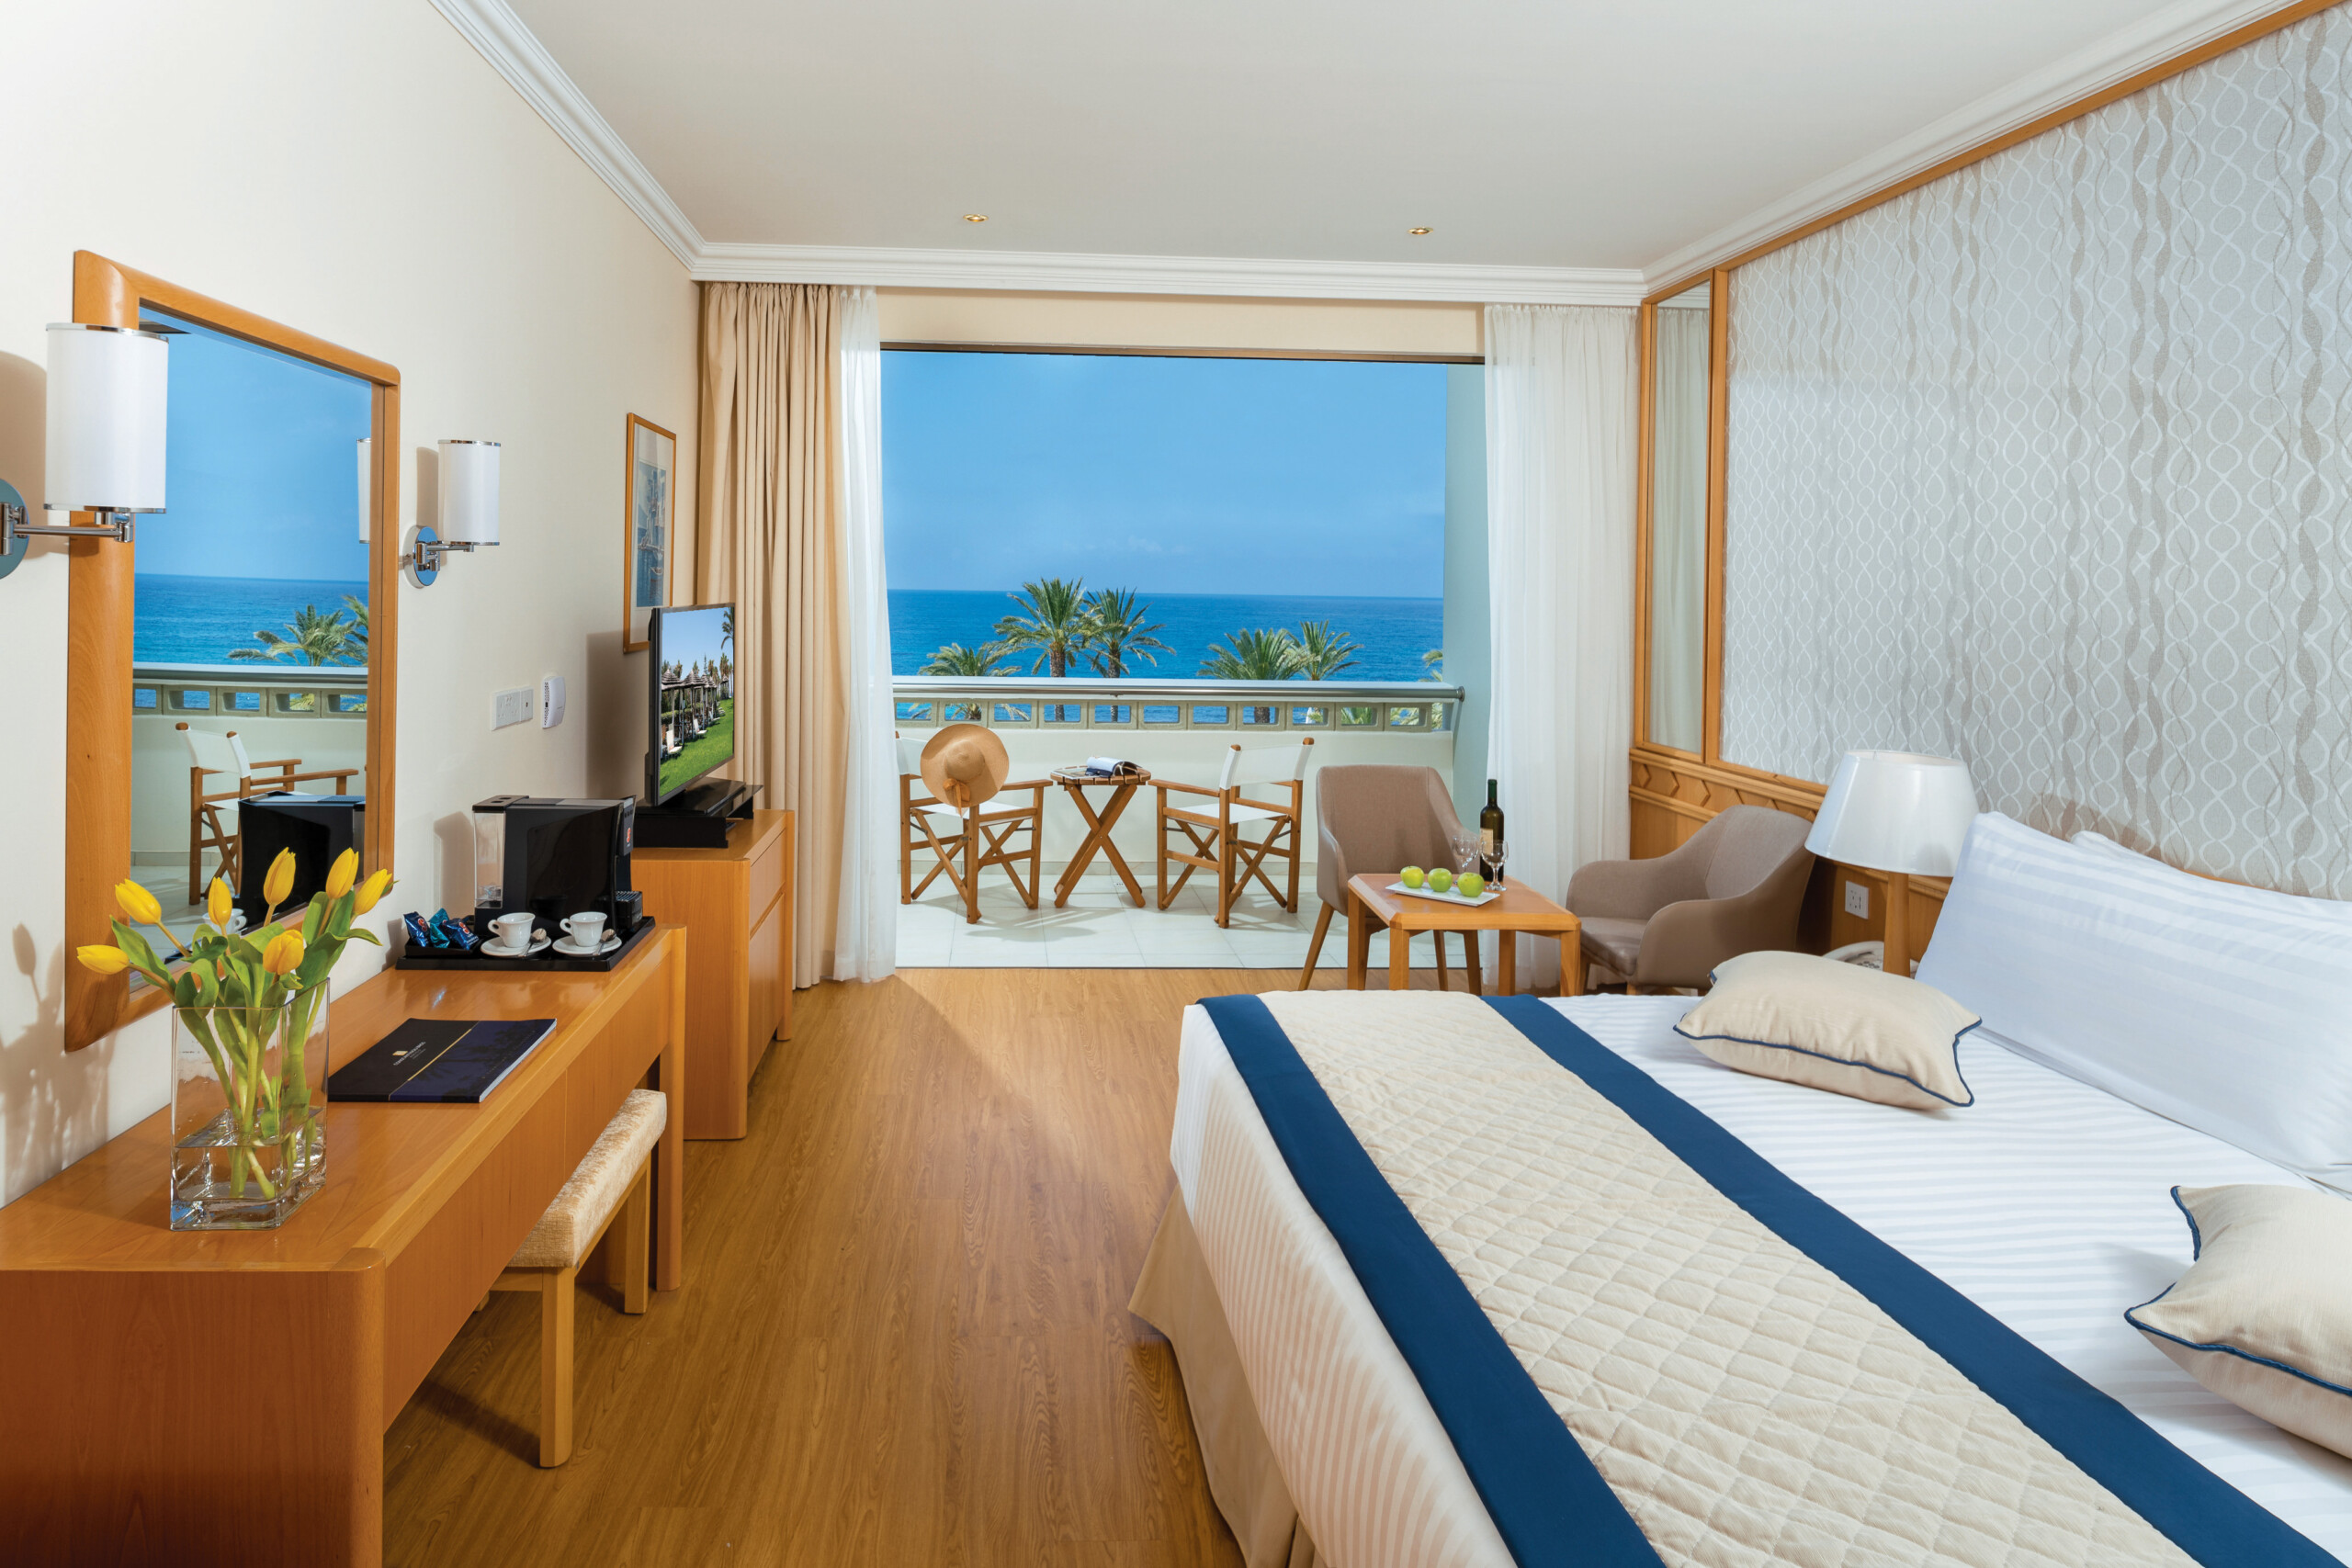 41 ATHENA BEACH HOTEL SUPERIOR ROOM SV